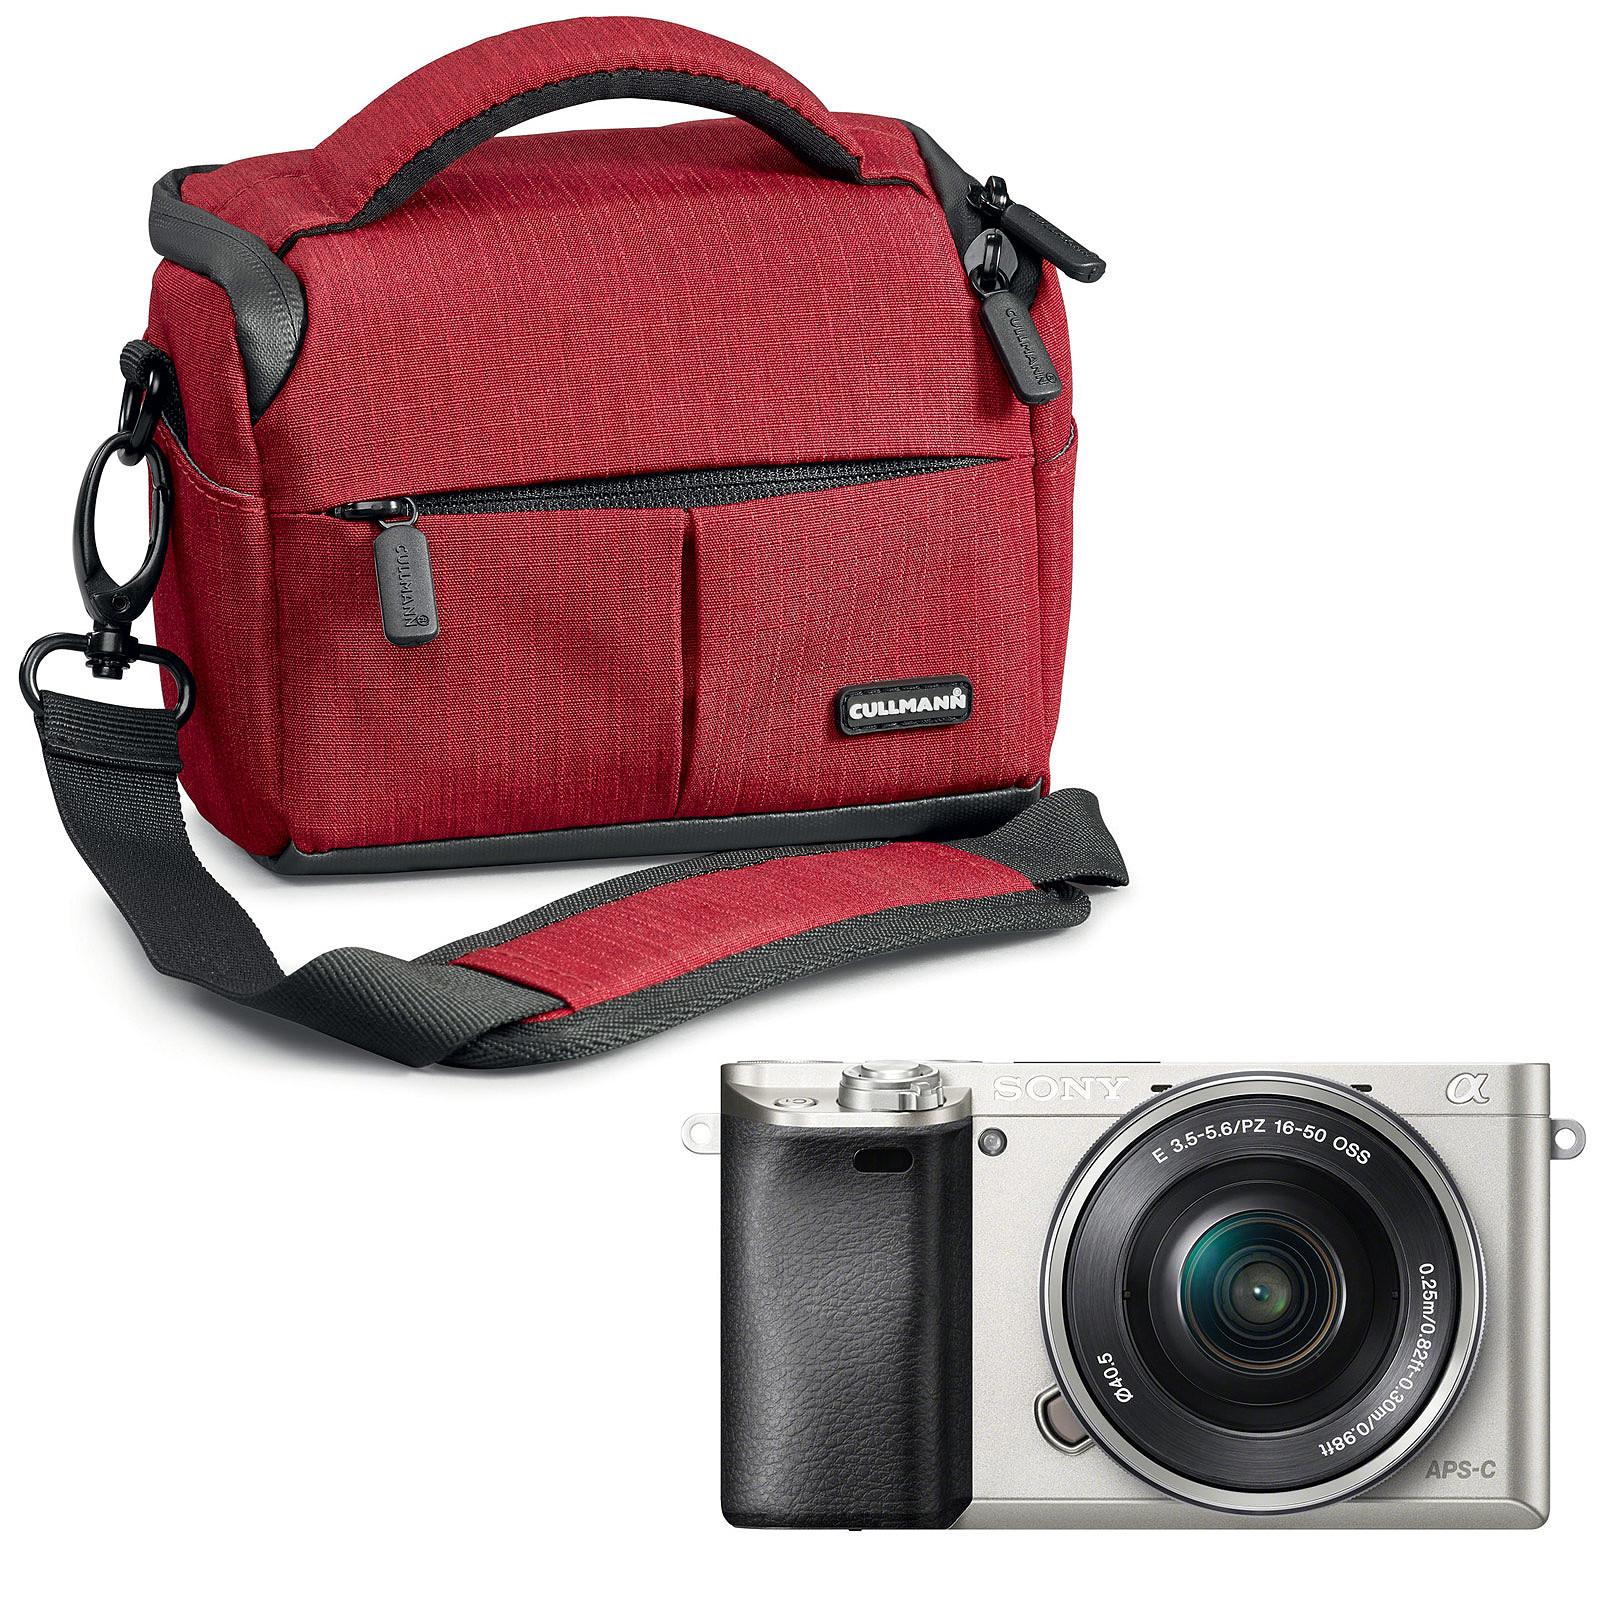 Sony Alpha 6000 + Objectif 16-50 mm Argent + Cullmann Malaga Vario 200 Rouge